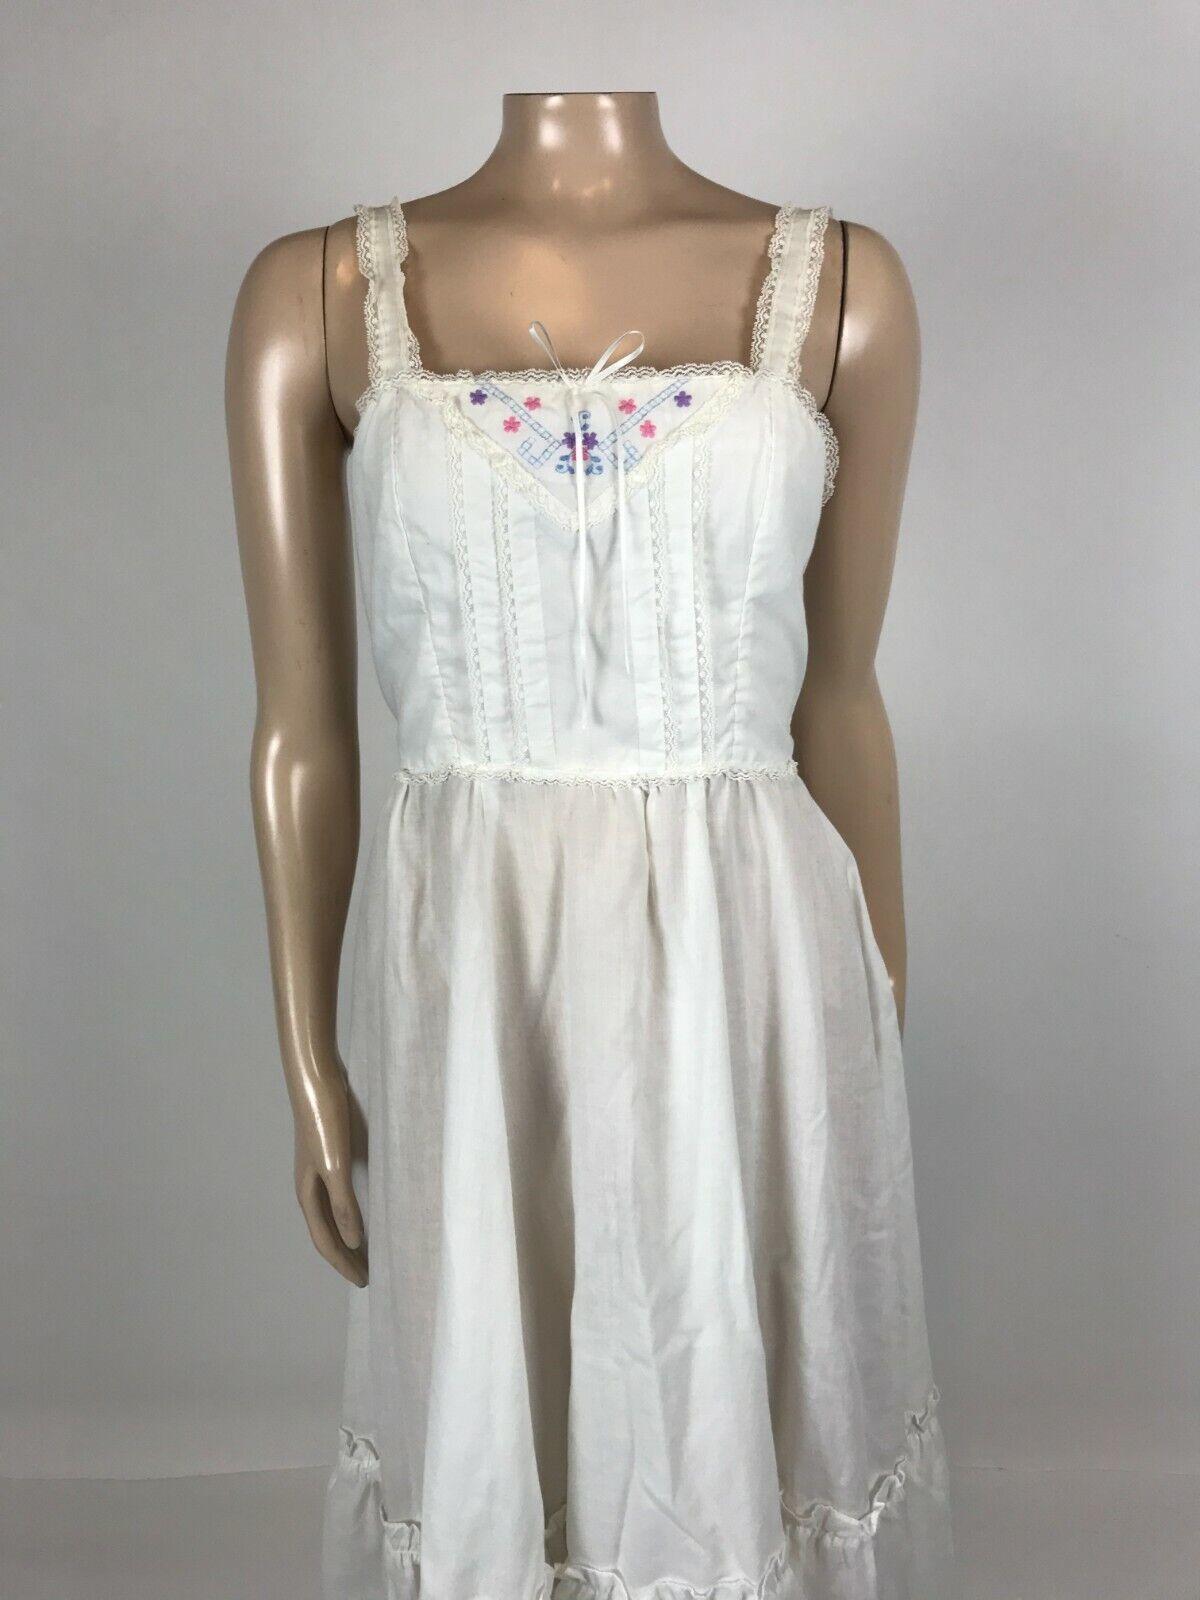 Vintage 70's Gunne Sax Women's Dress 9 cotton Flo… - image 2